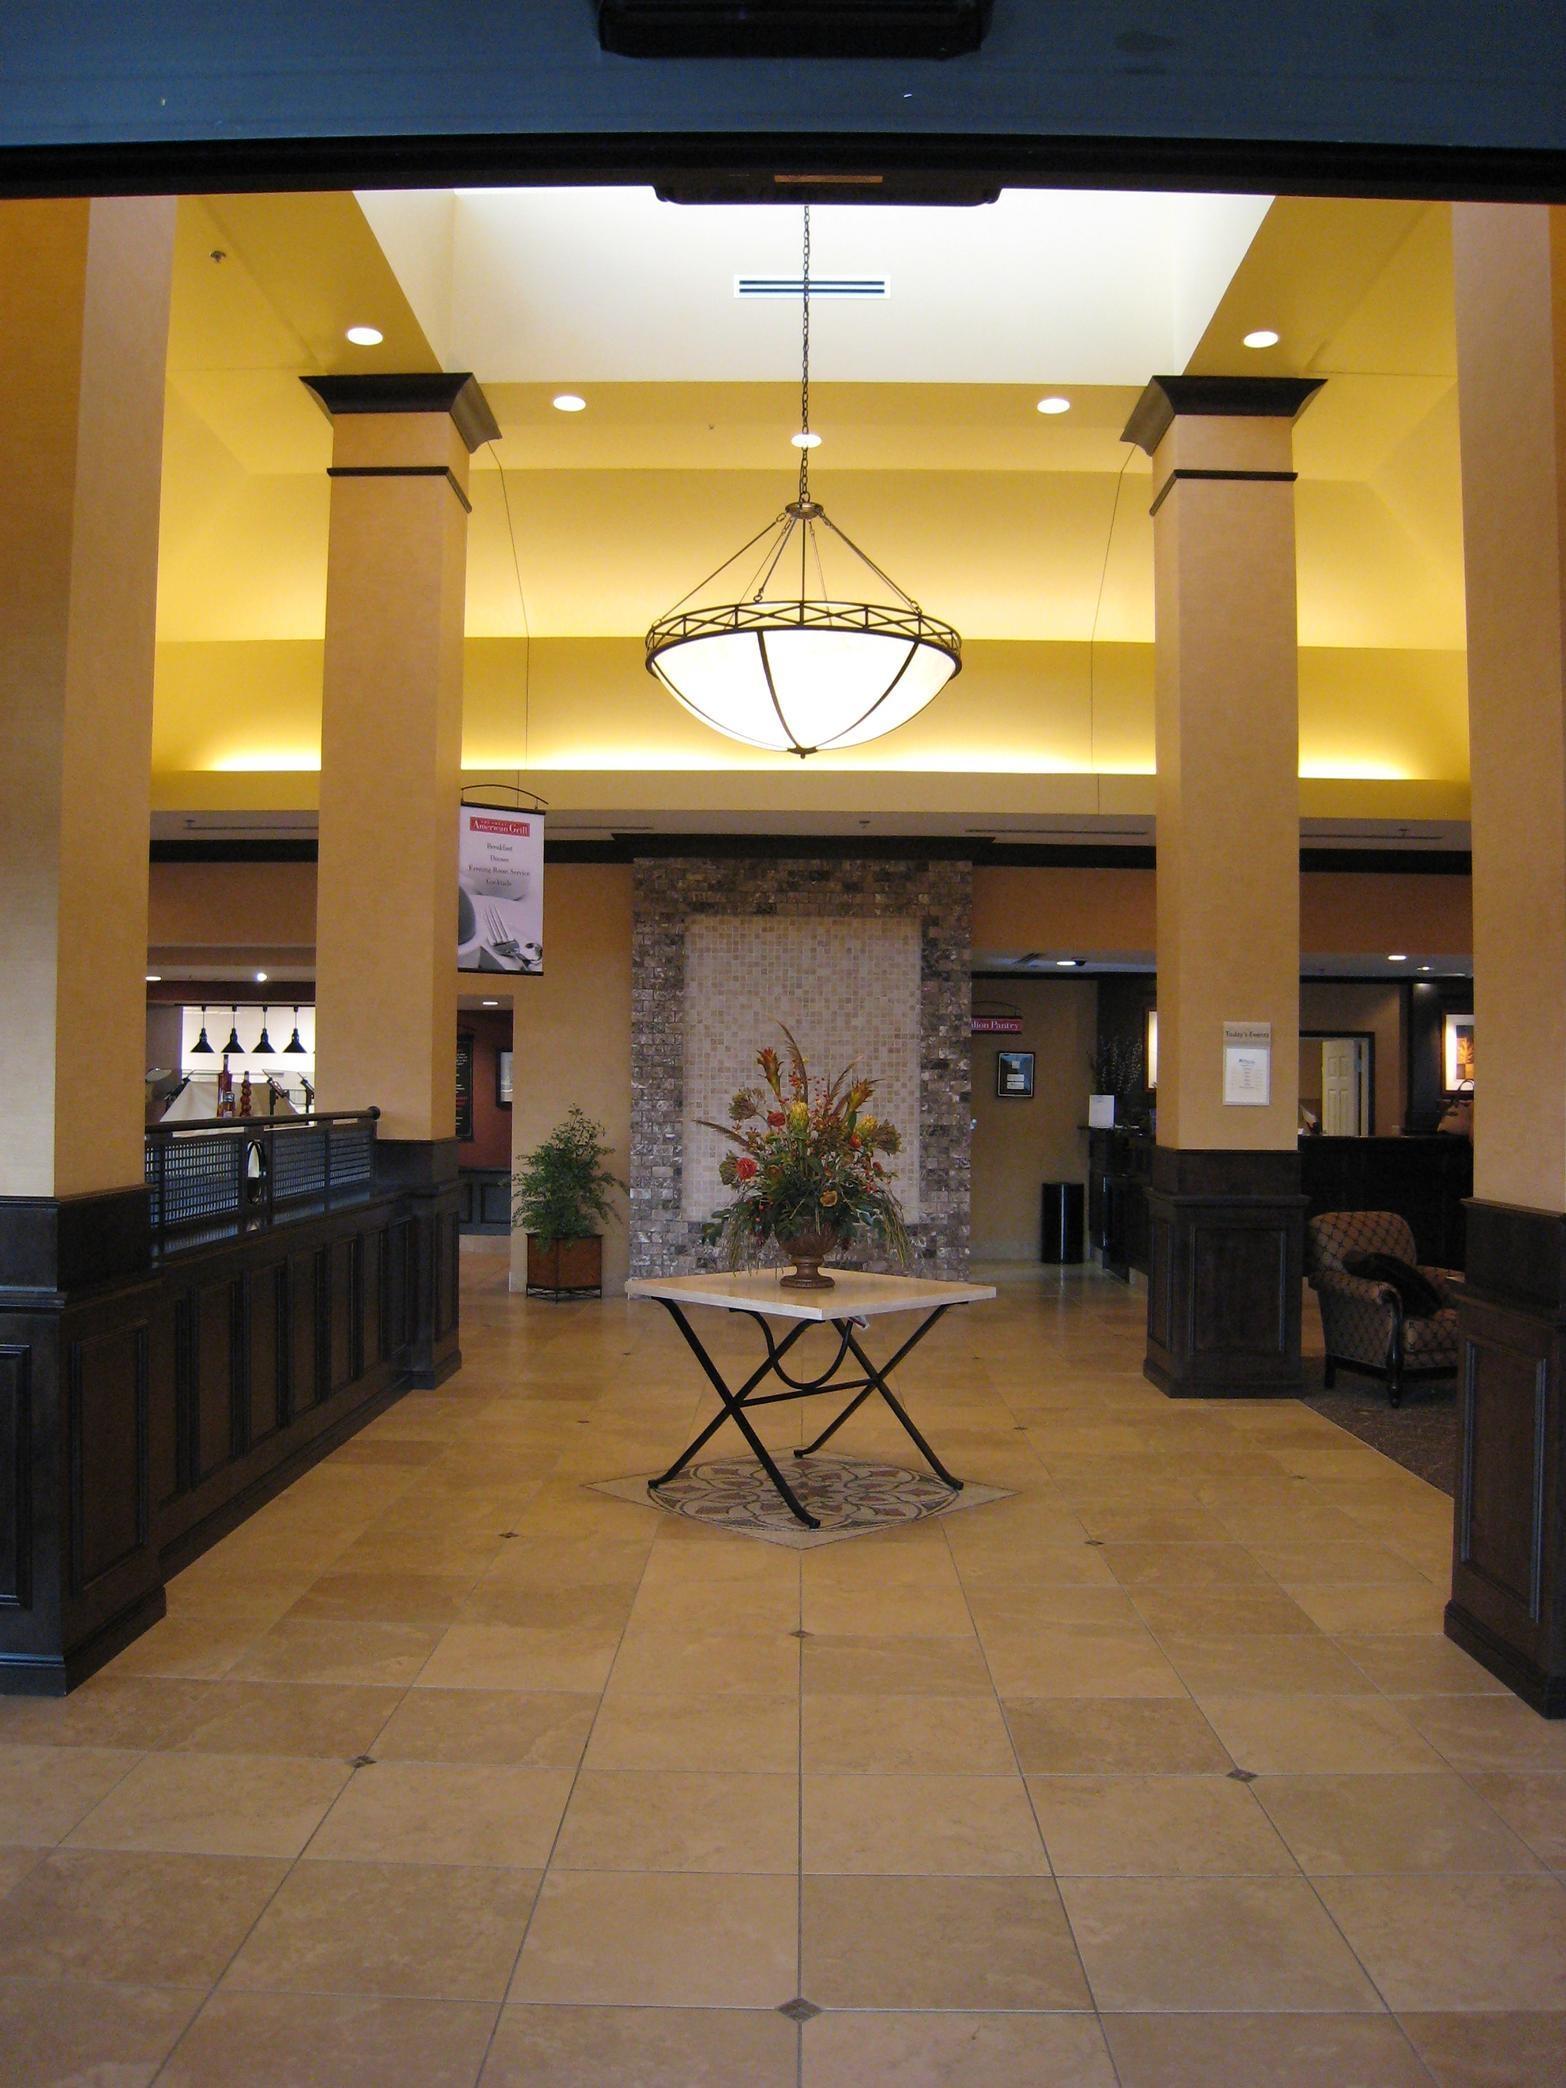 Hilton Garden Inn Denver/Highlands Ranch image 4